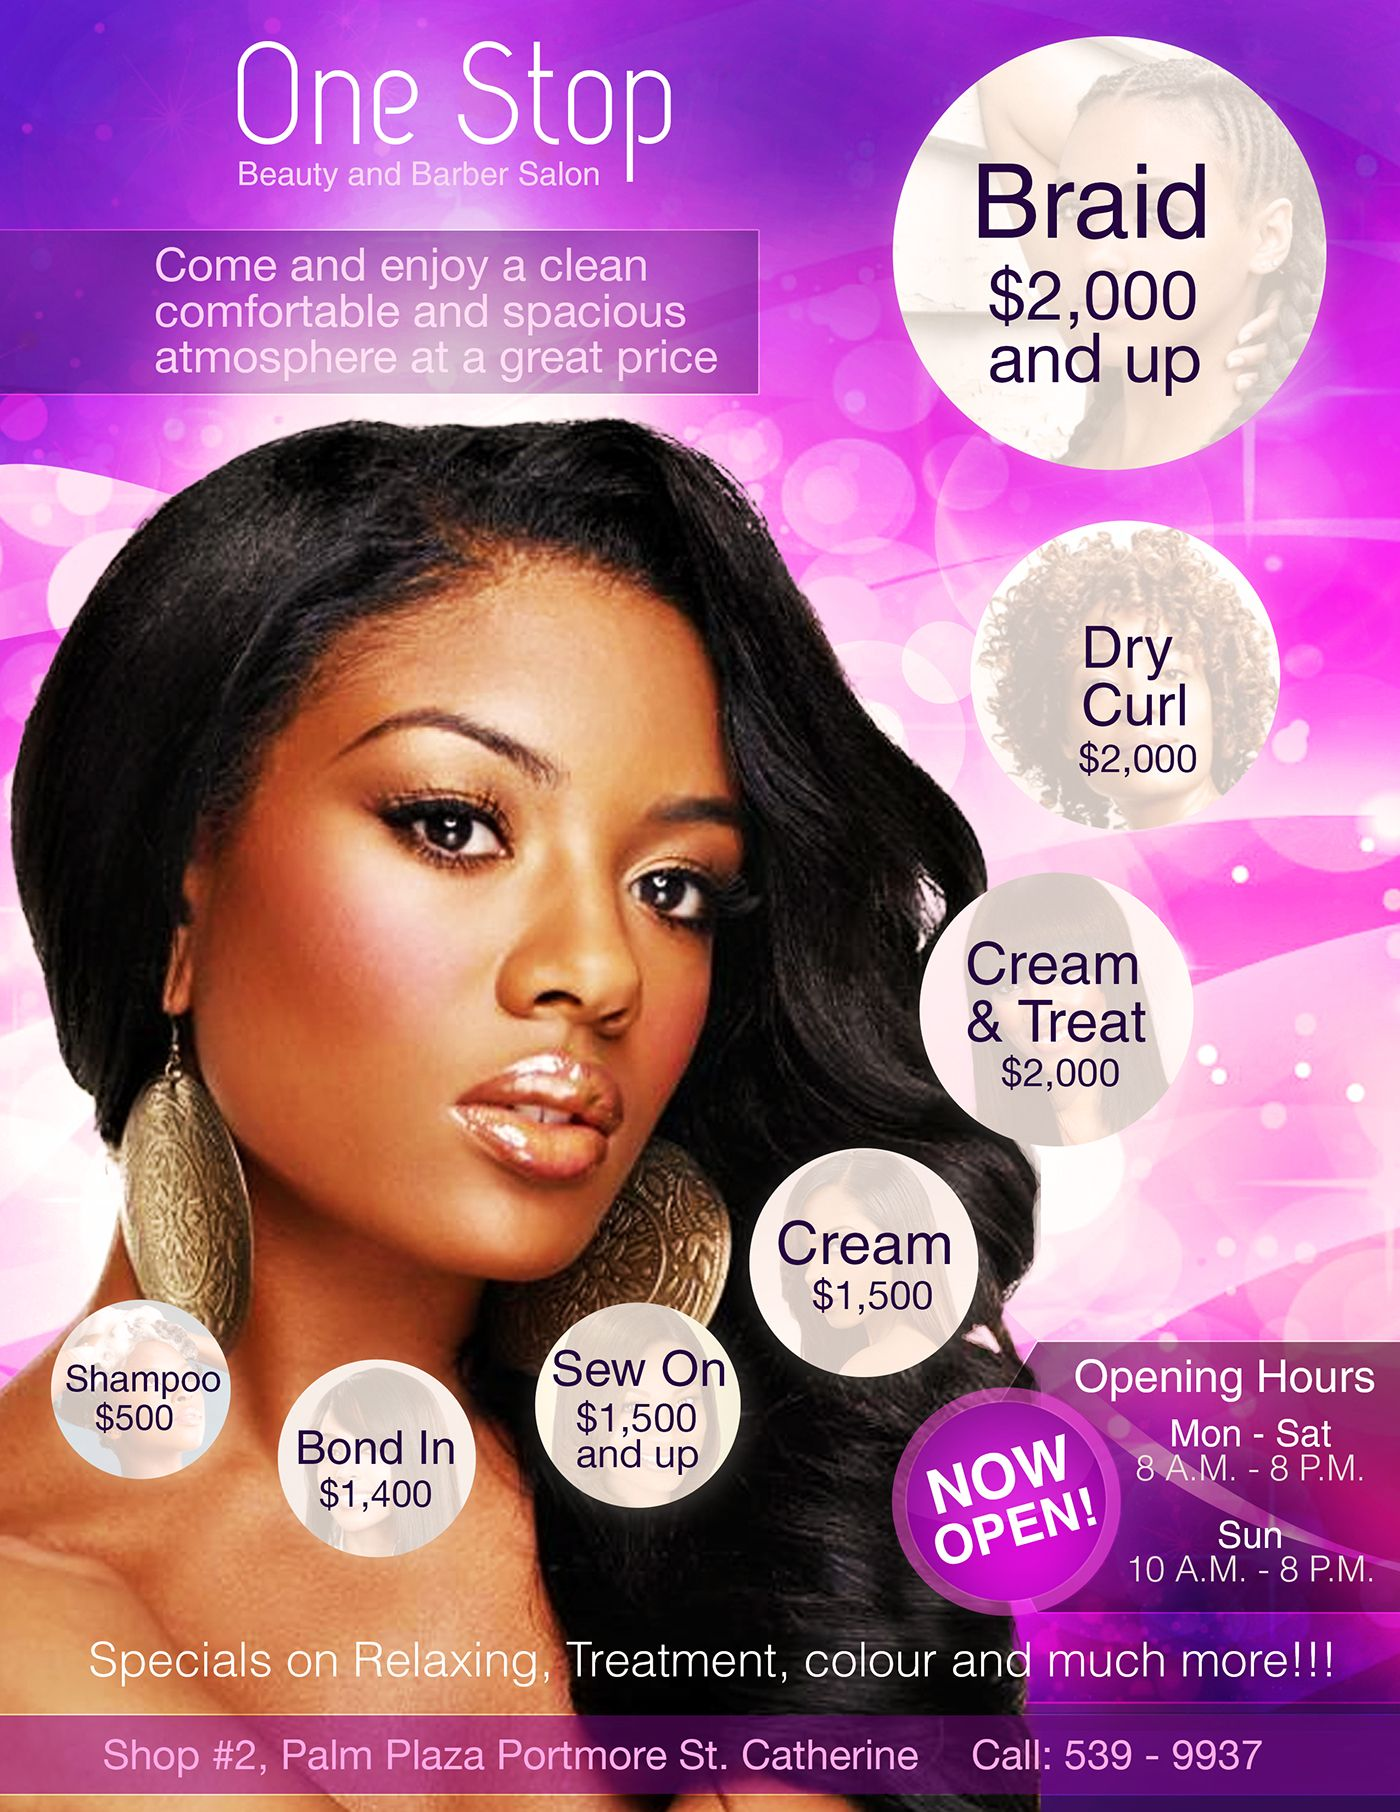 One Stop Hair Salon Flyer Design On Behance Uptown Glamour Hair